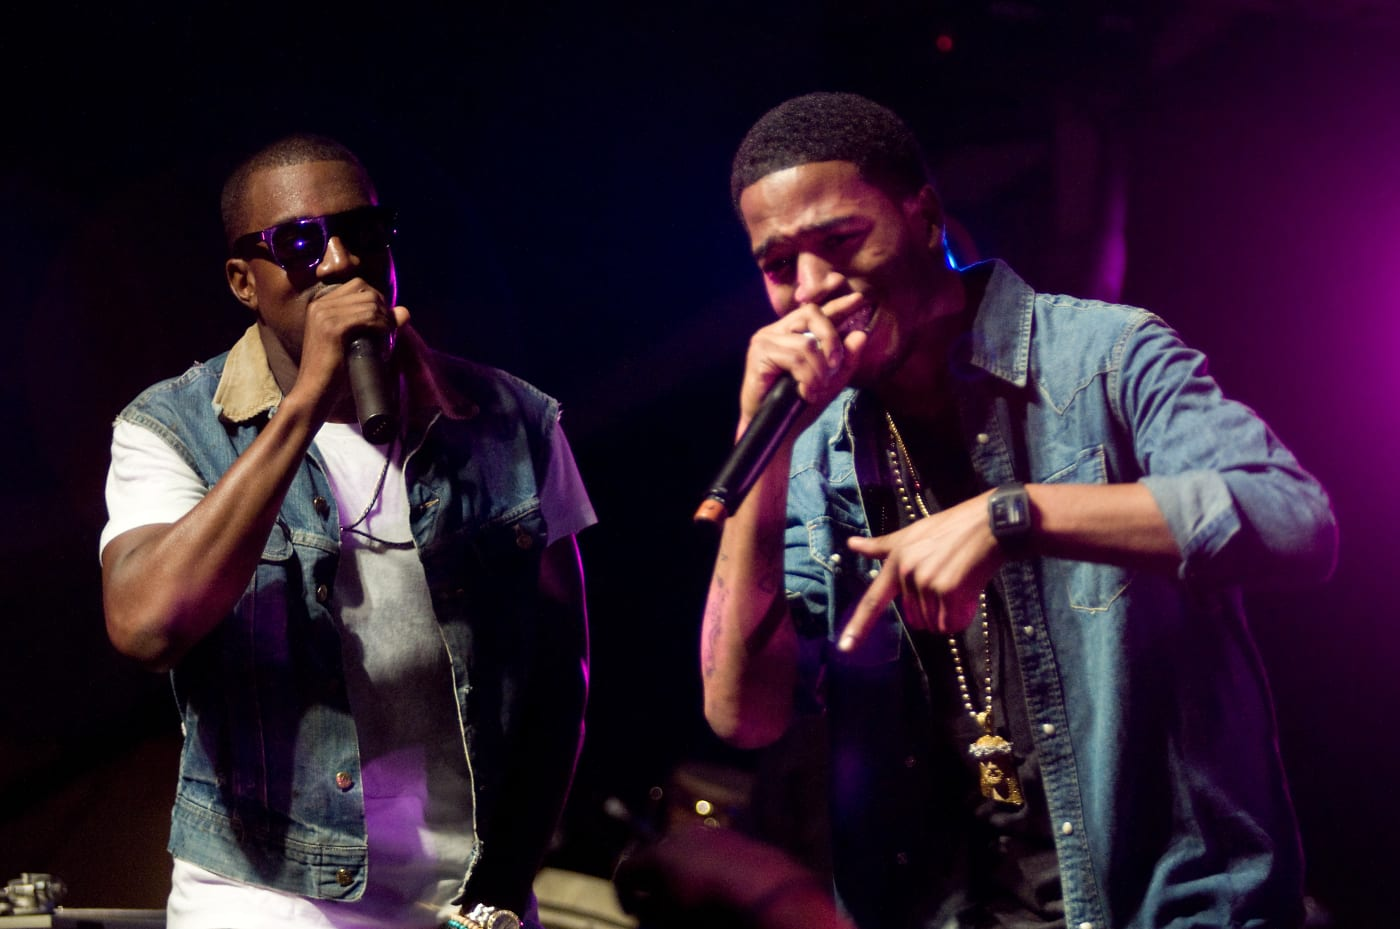 Kanye West and Kid Cudi perform on stage